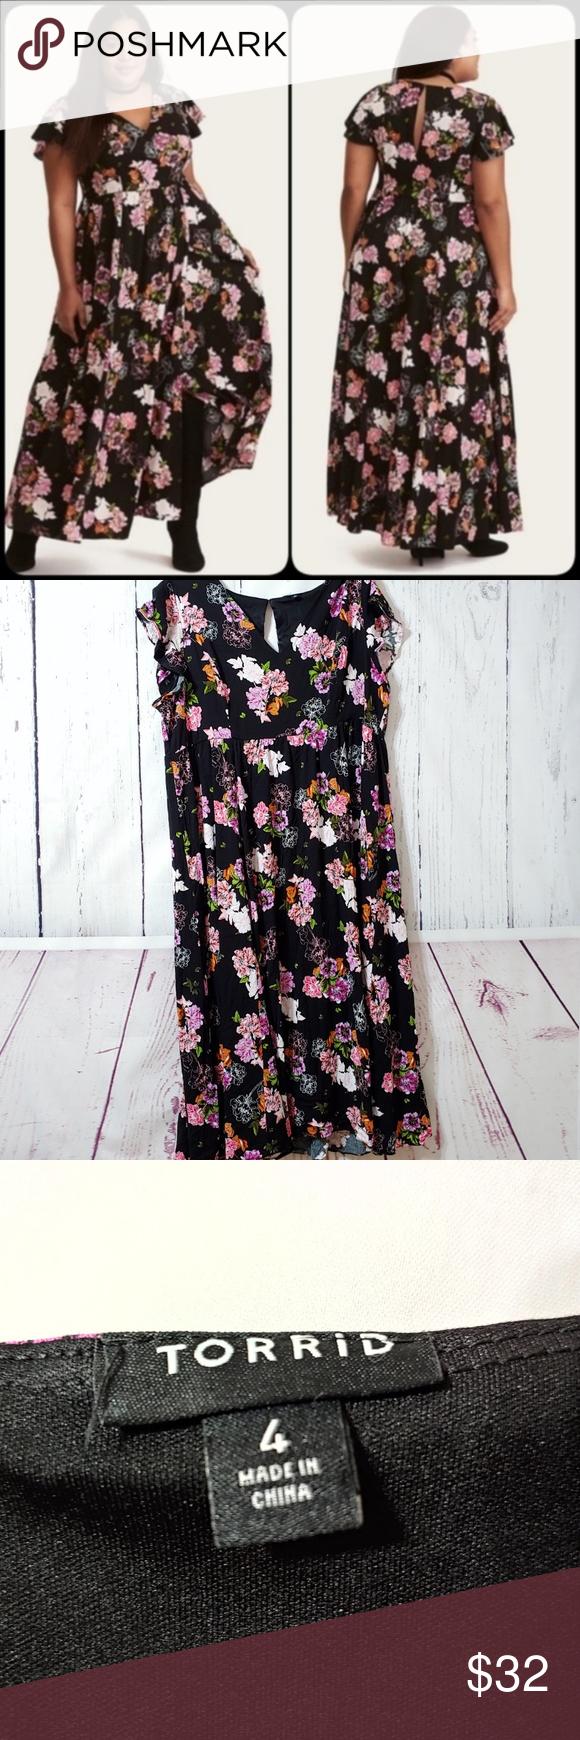 Torrid 4 Black Floral Short Sleeve Maxi Dress Torrid 4 Black Floral Short Sleeve Maxi Dress Size 4x Short Maxi Dress Full Maxi Dress Short Sleeve Maxi Dresses [ 1740 x 580 Pixel ]